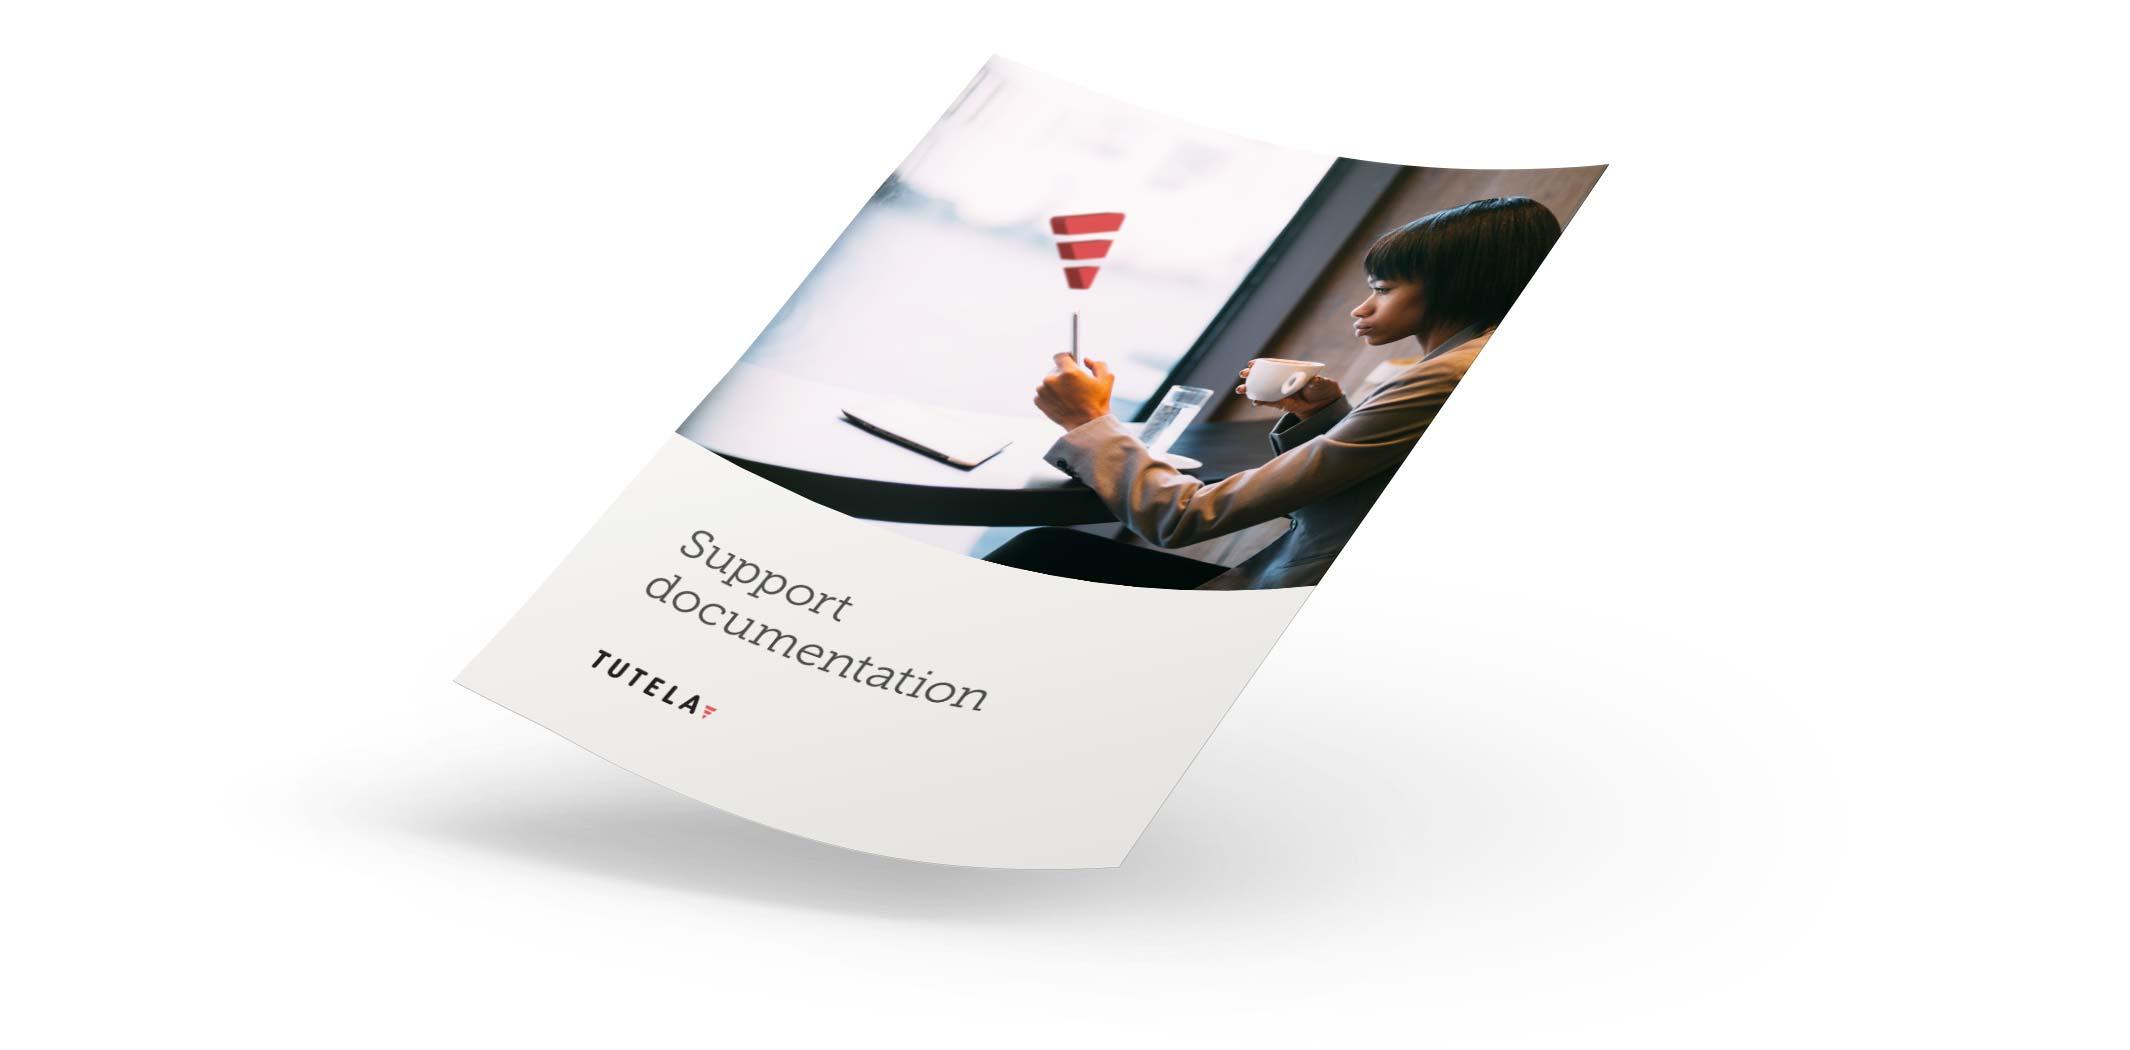 Support documentation